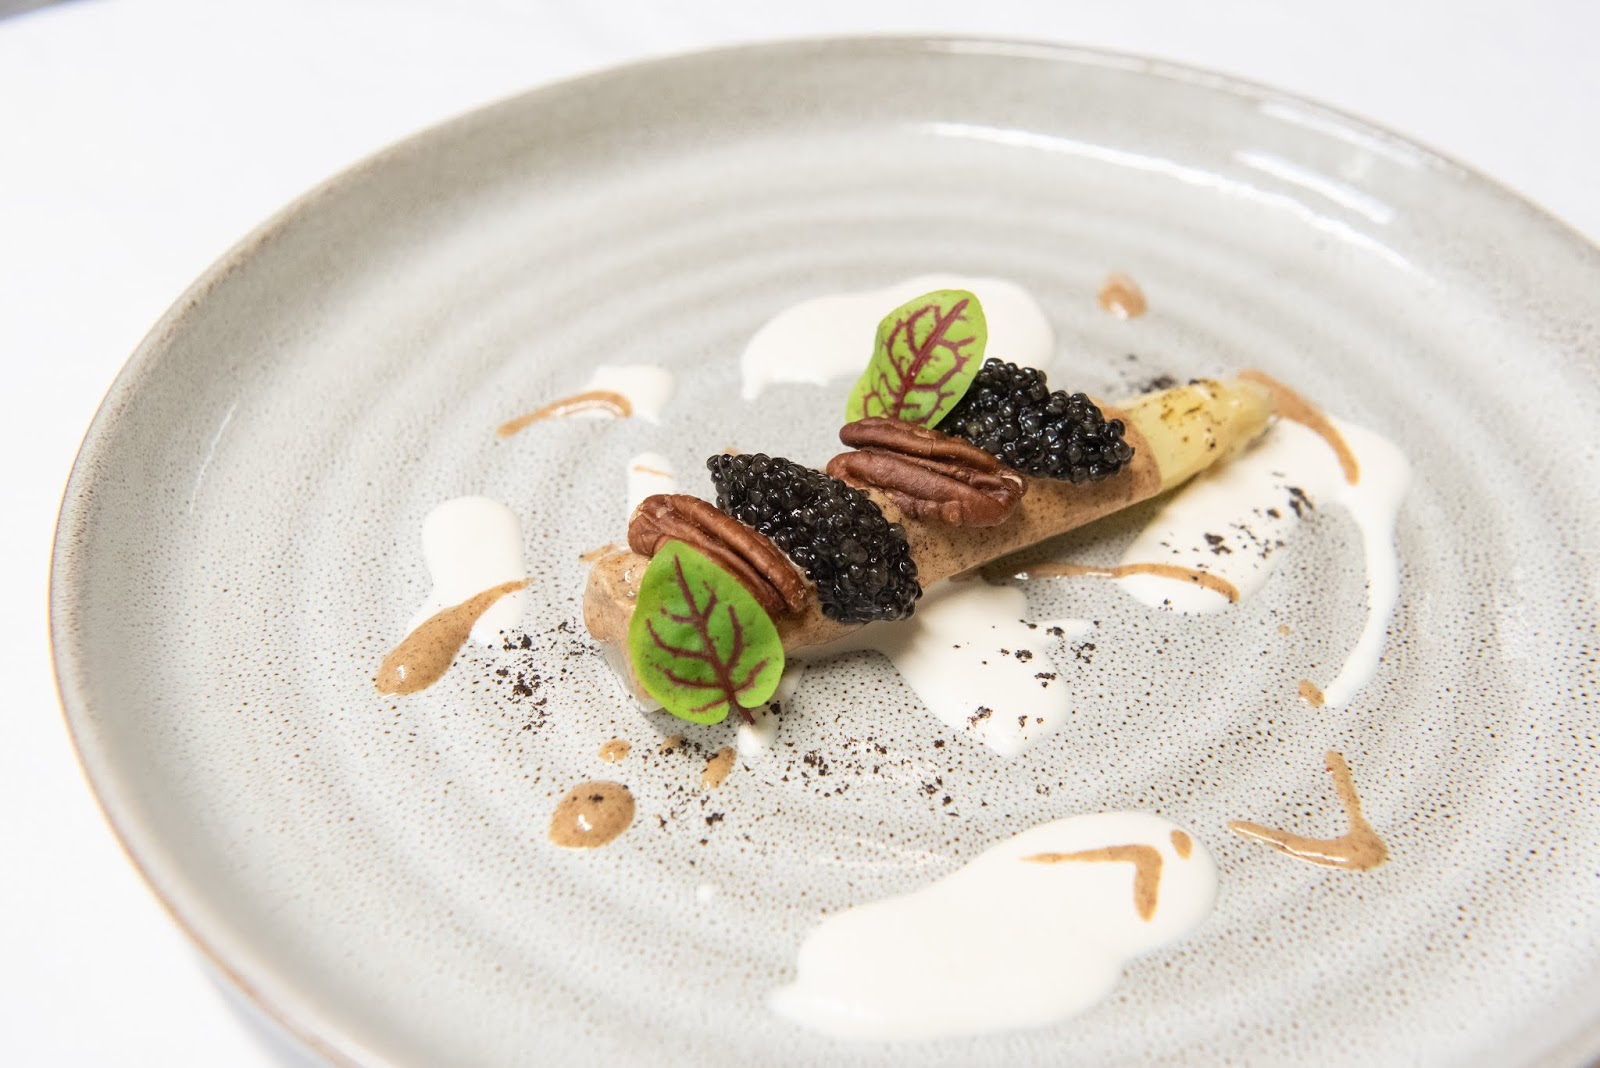 Asparago bianco, miso, noci pecan e caviale